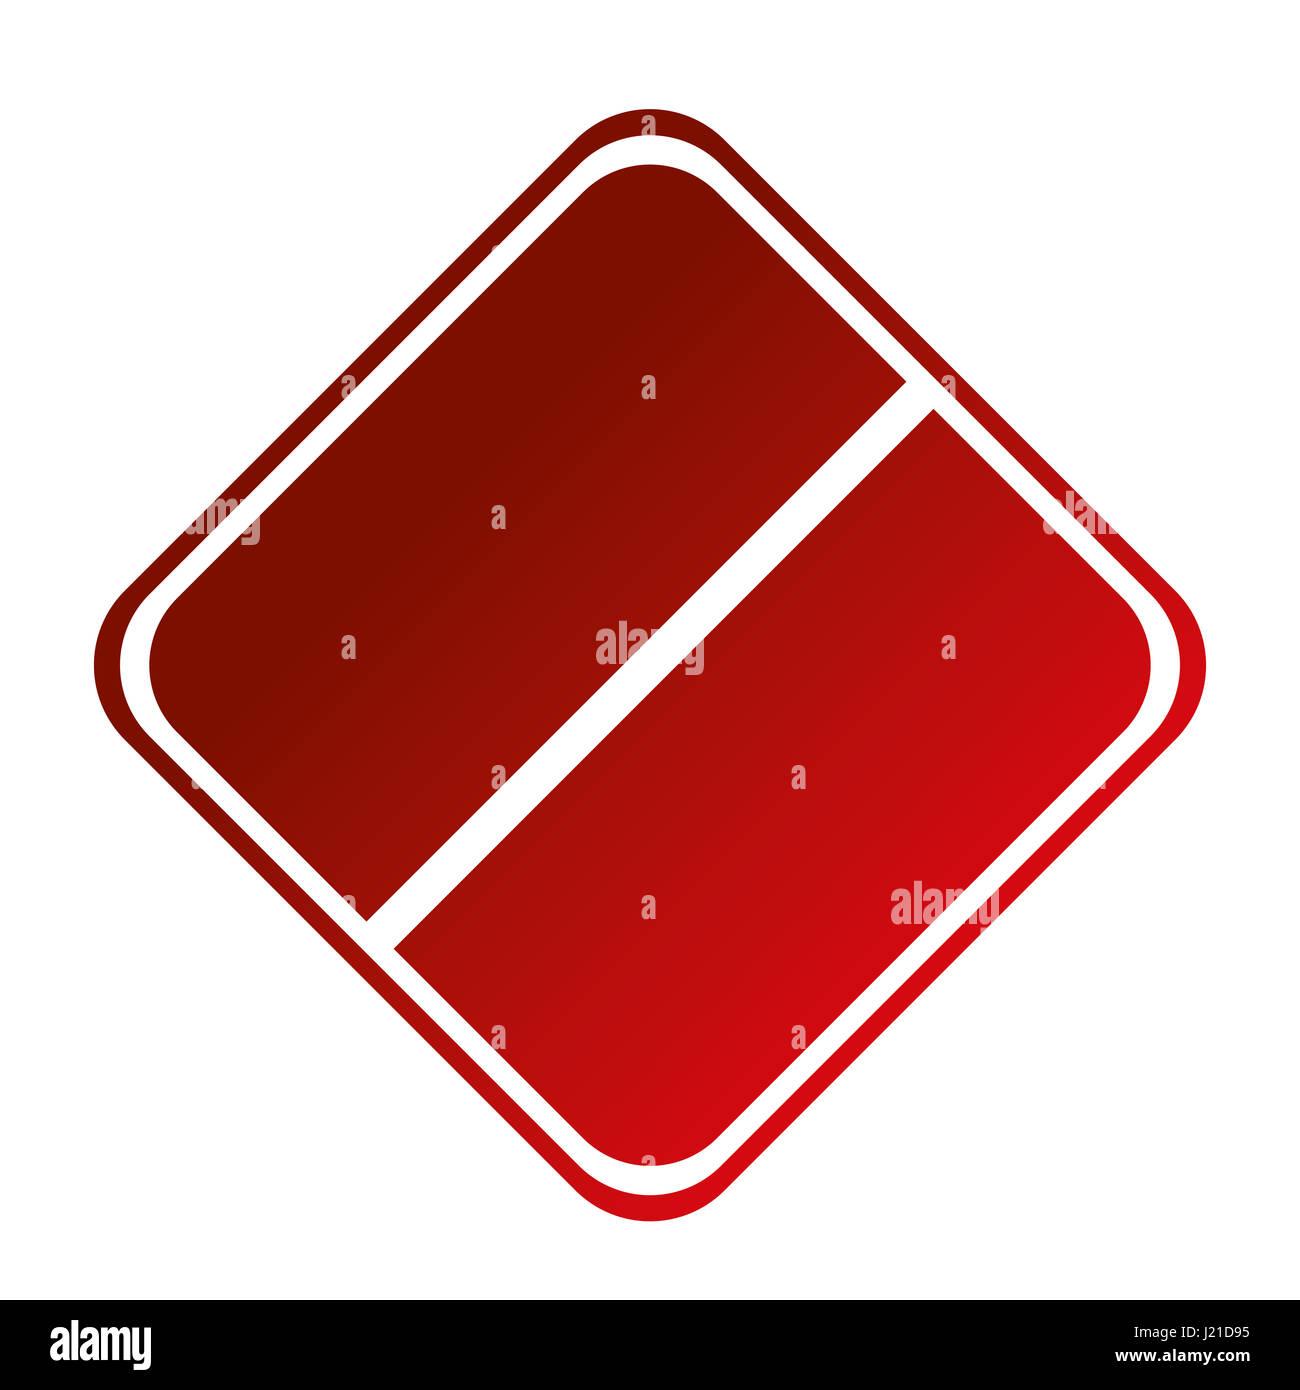 forbidden sign icon - Stock Image